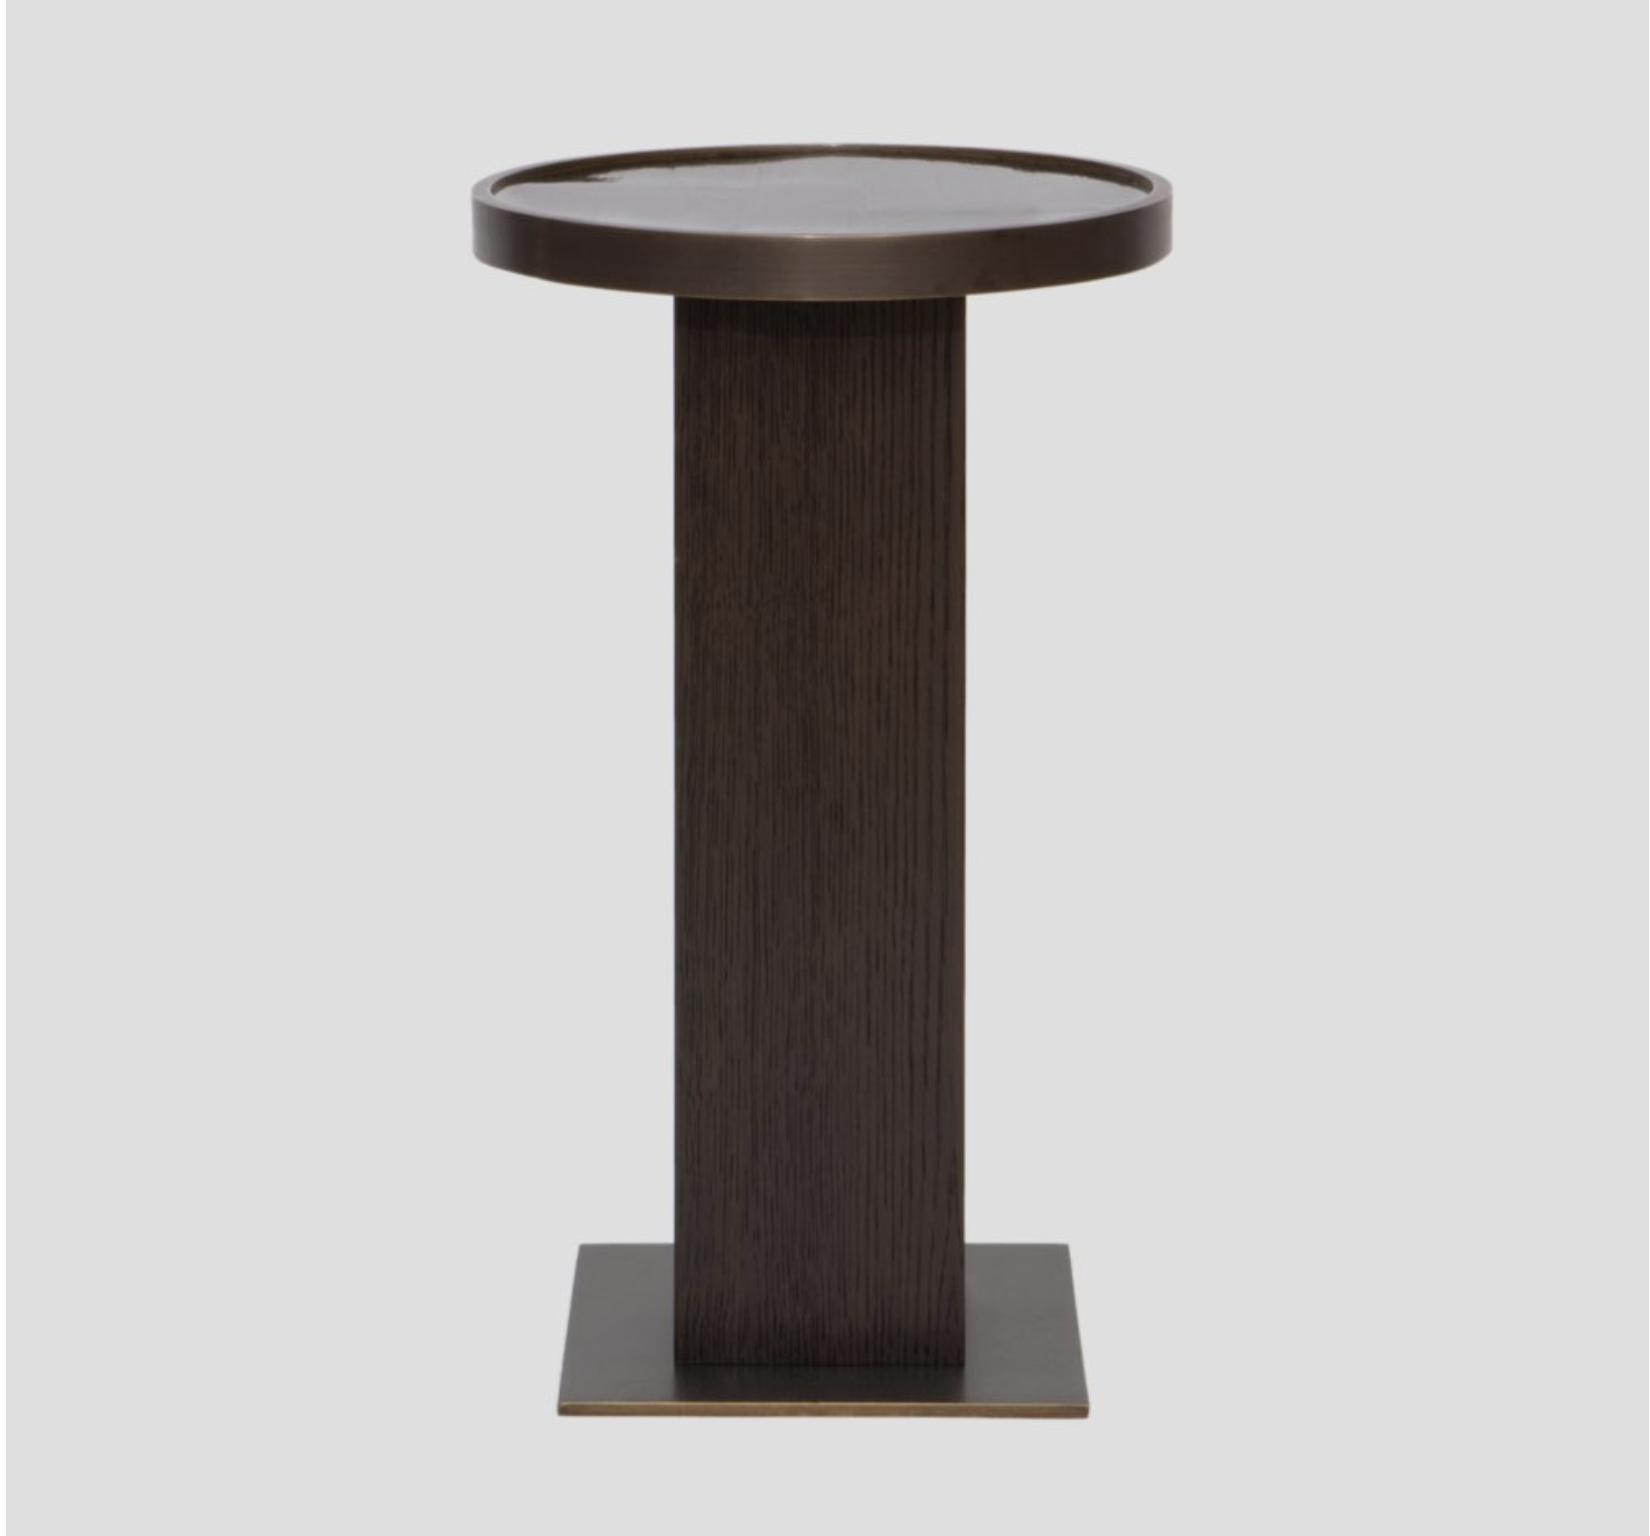 Aguirre Design - Moka Side Table - Bamboo, Brass and Oak